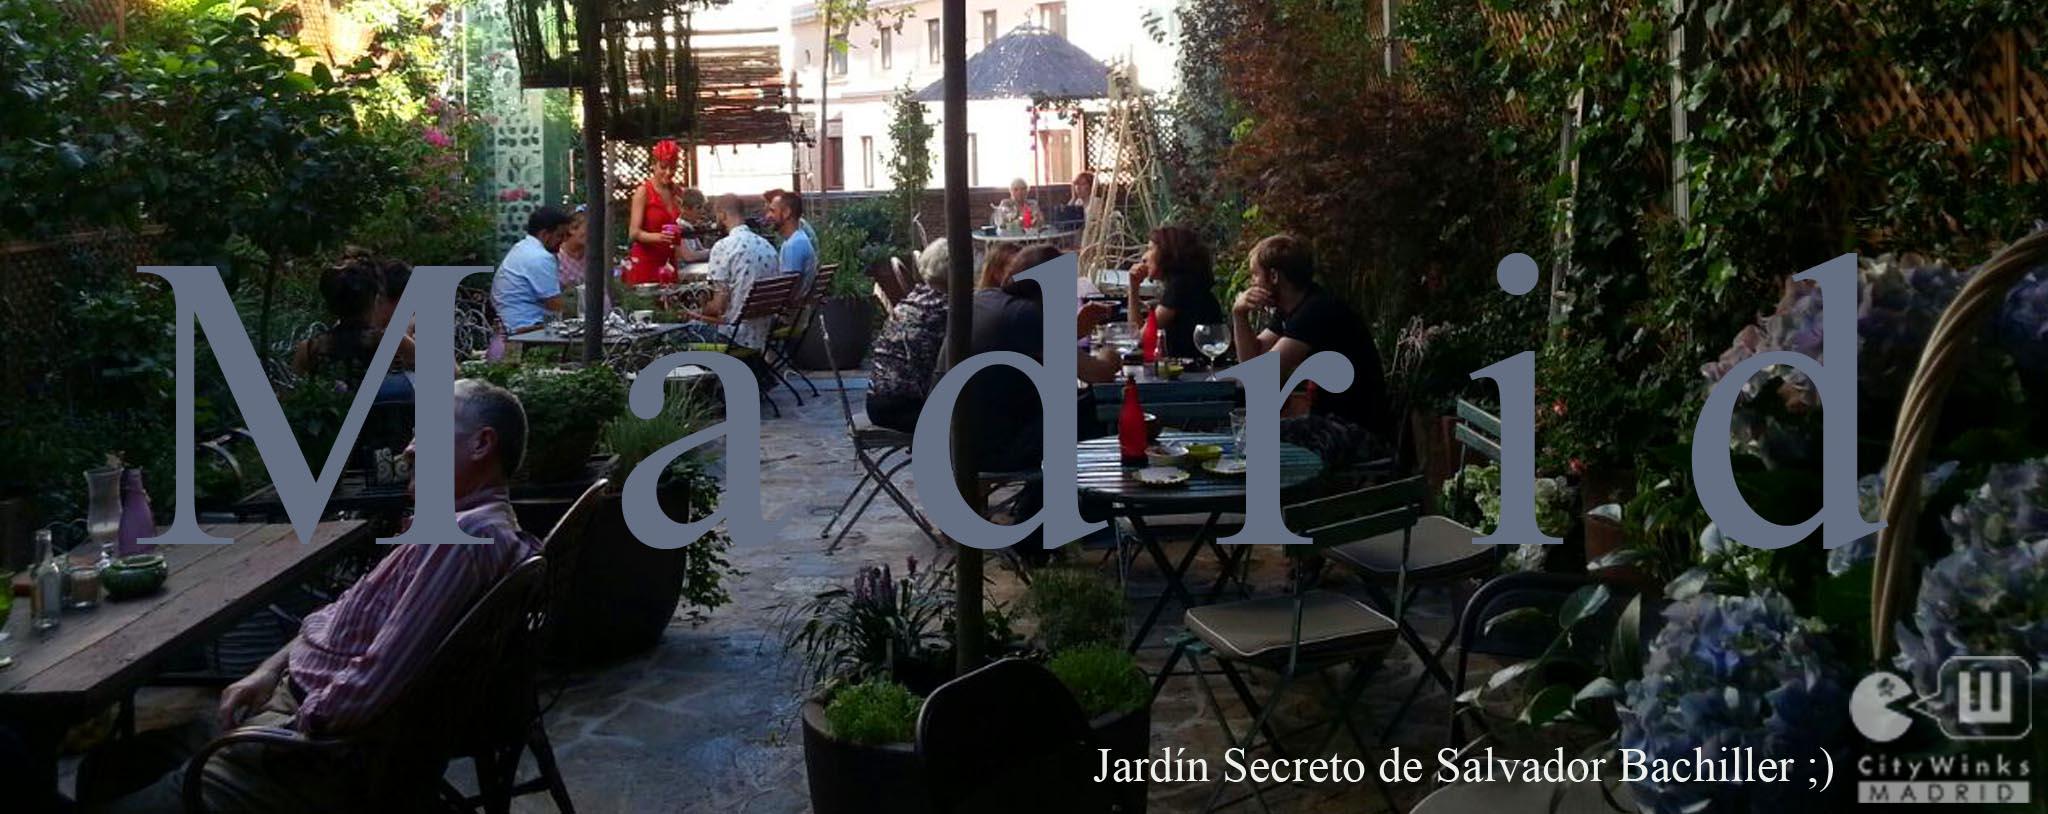 Viaje al jard n secreto y sal n de t vip lounge de for Salvador bachiller jardin secreto